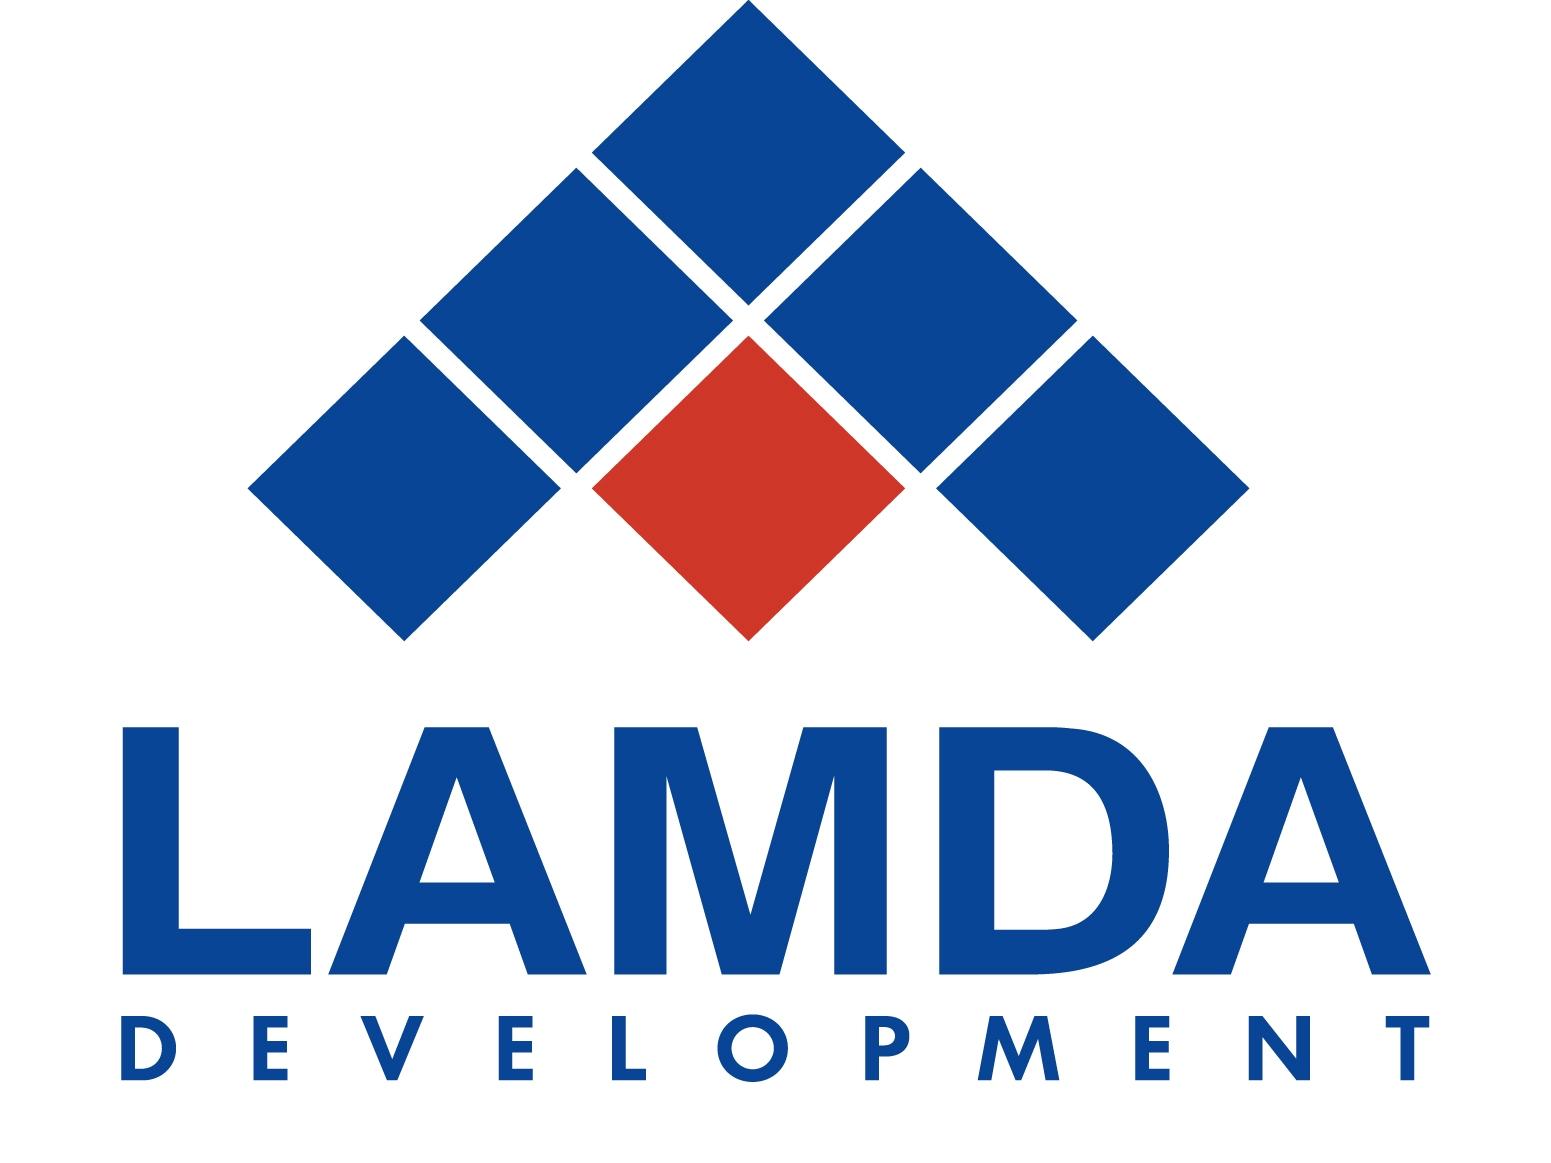 Lamda Development: Κέρδη-ρεκόρ 224,6 εκατ. ευρώ με «όχημα» το Ελληνικό  για το πρώτο εξάμηνο